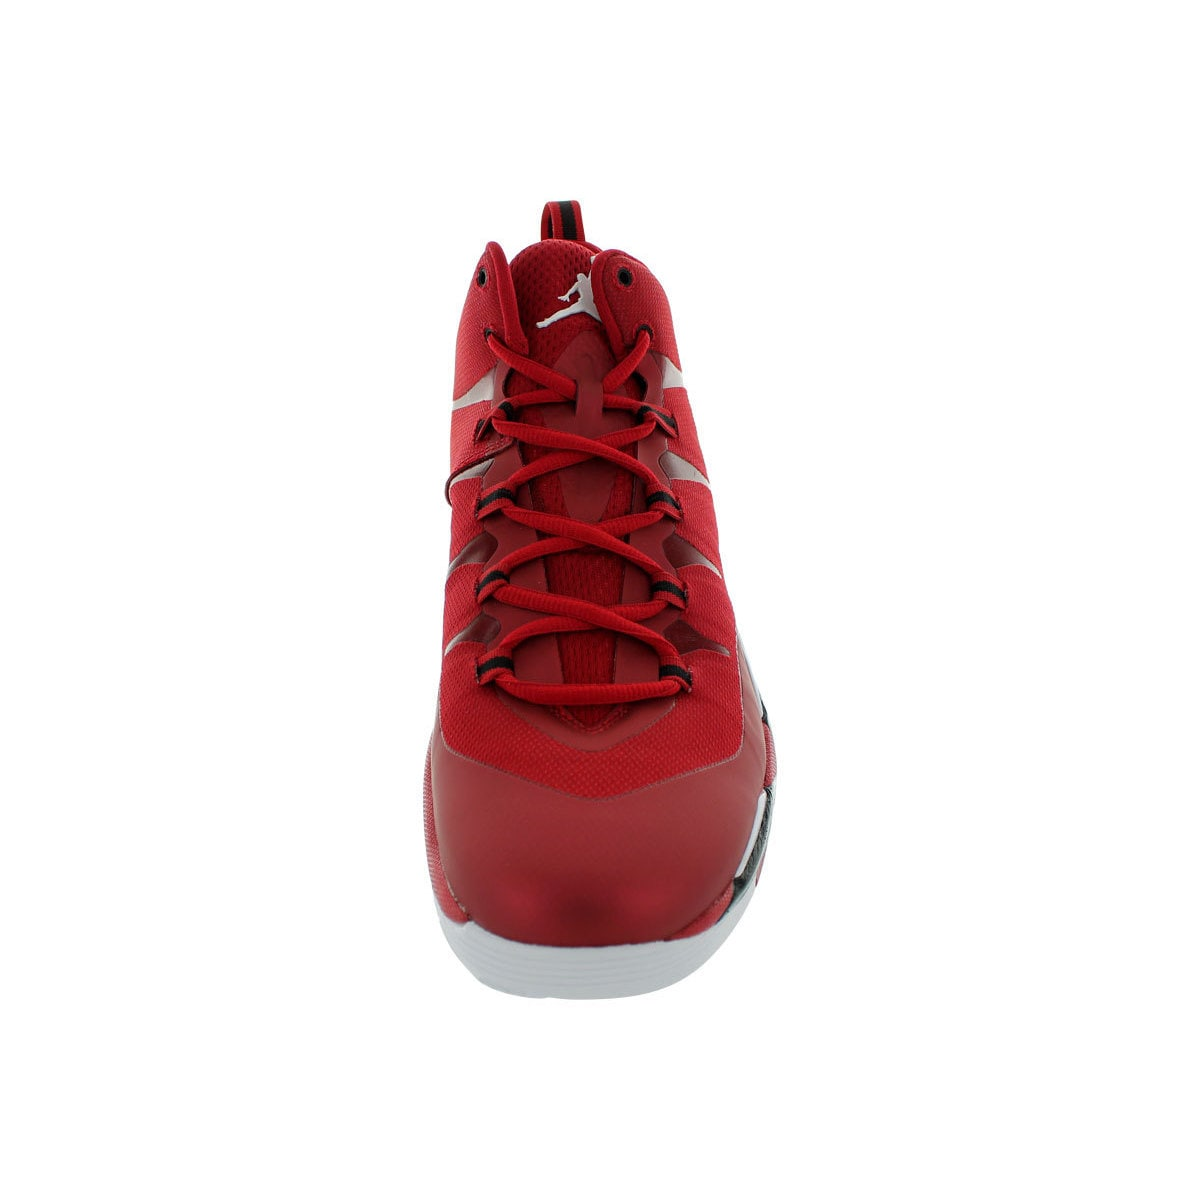 on sale 28581 0c156 france shop nike mens jordan super.fly 2 gym red white black white  basketball shoe